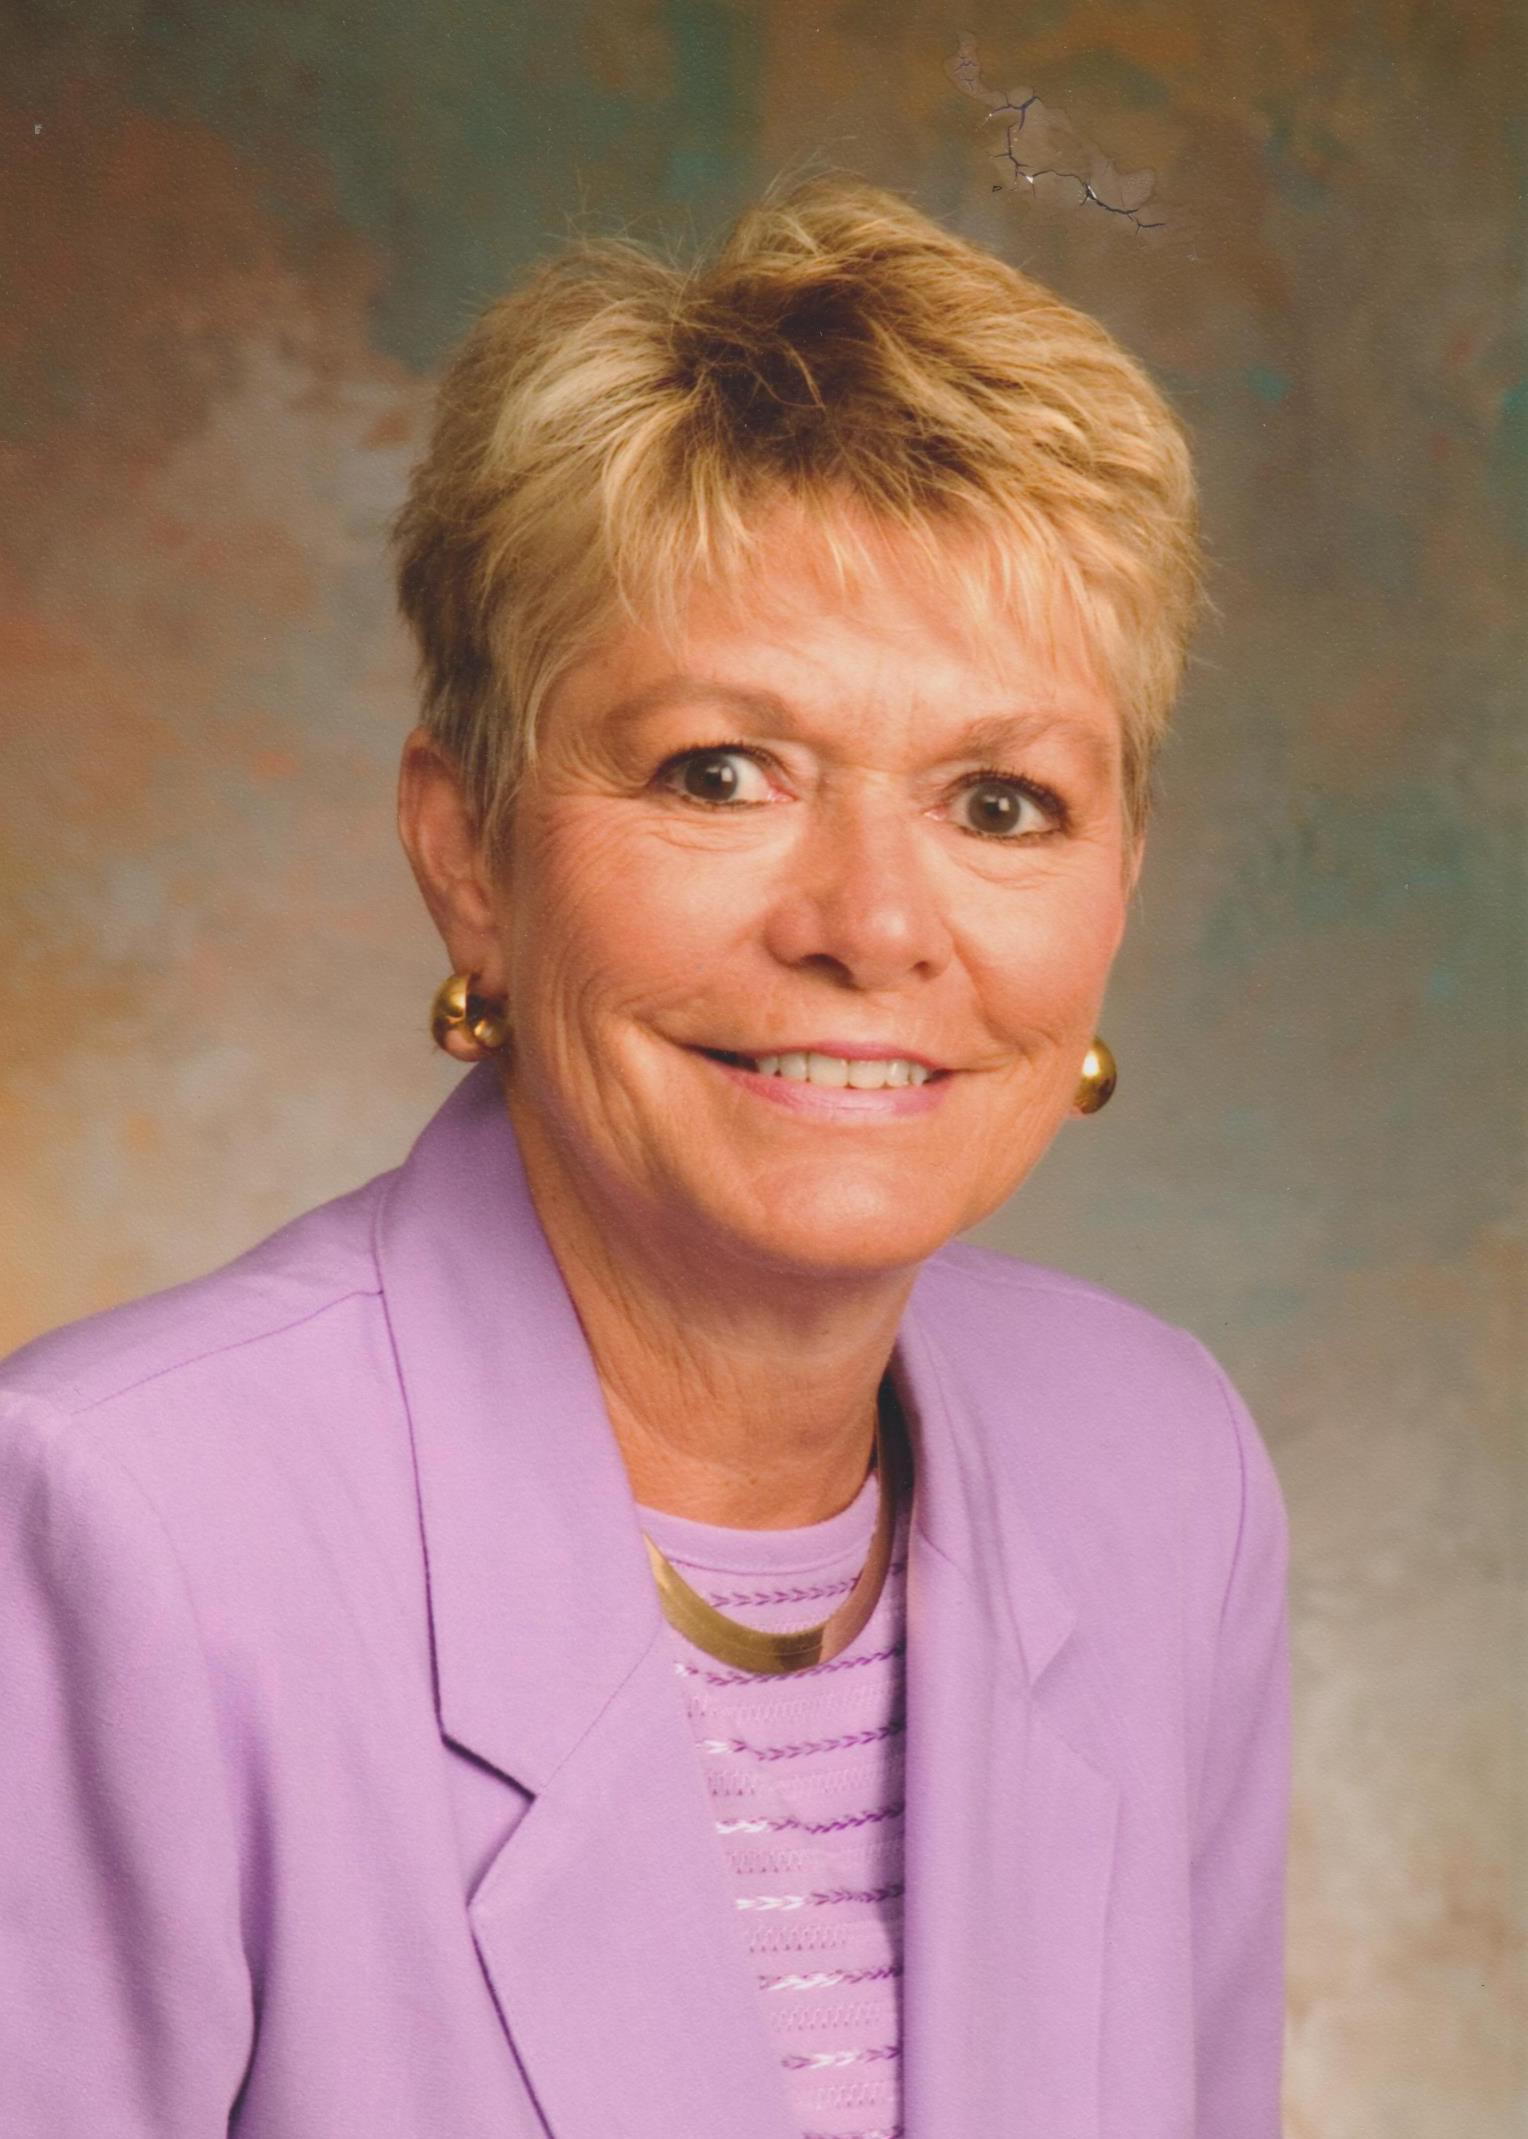 Sharon U. Thompson